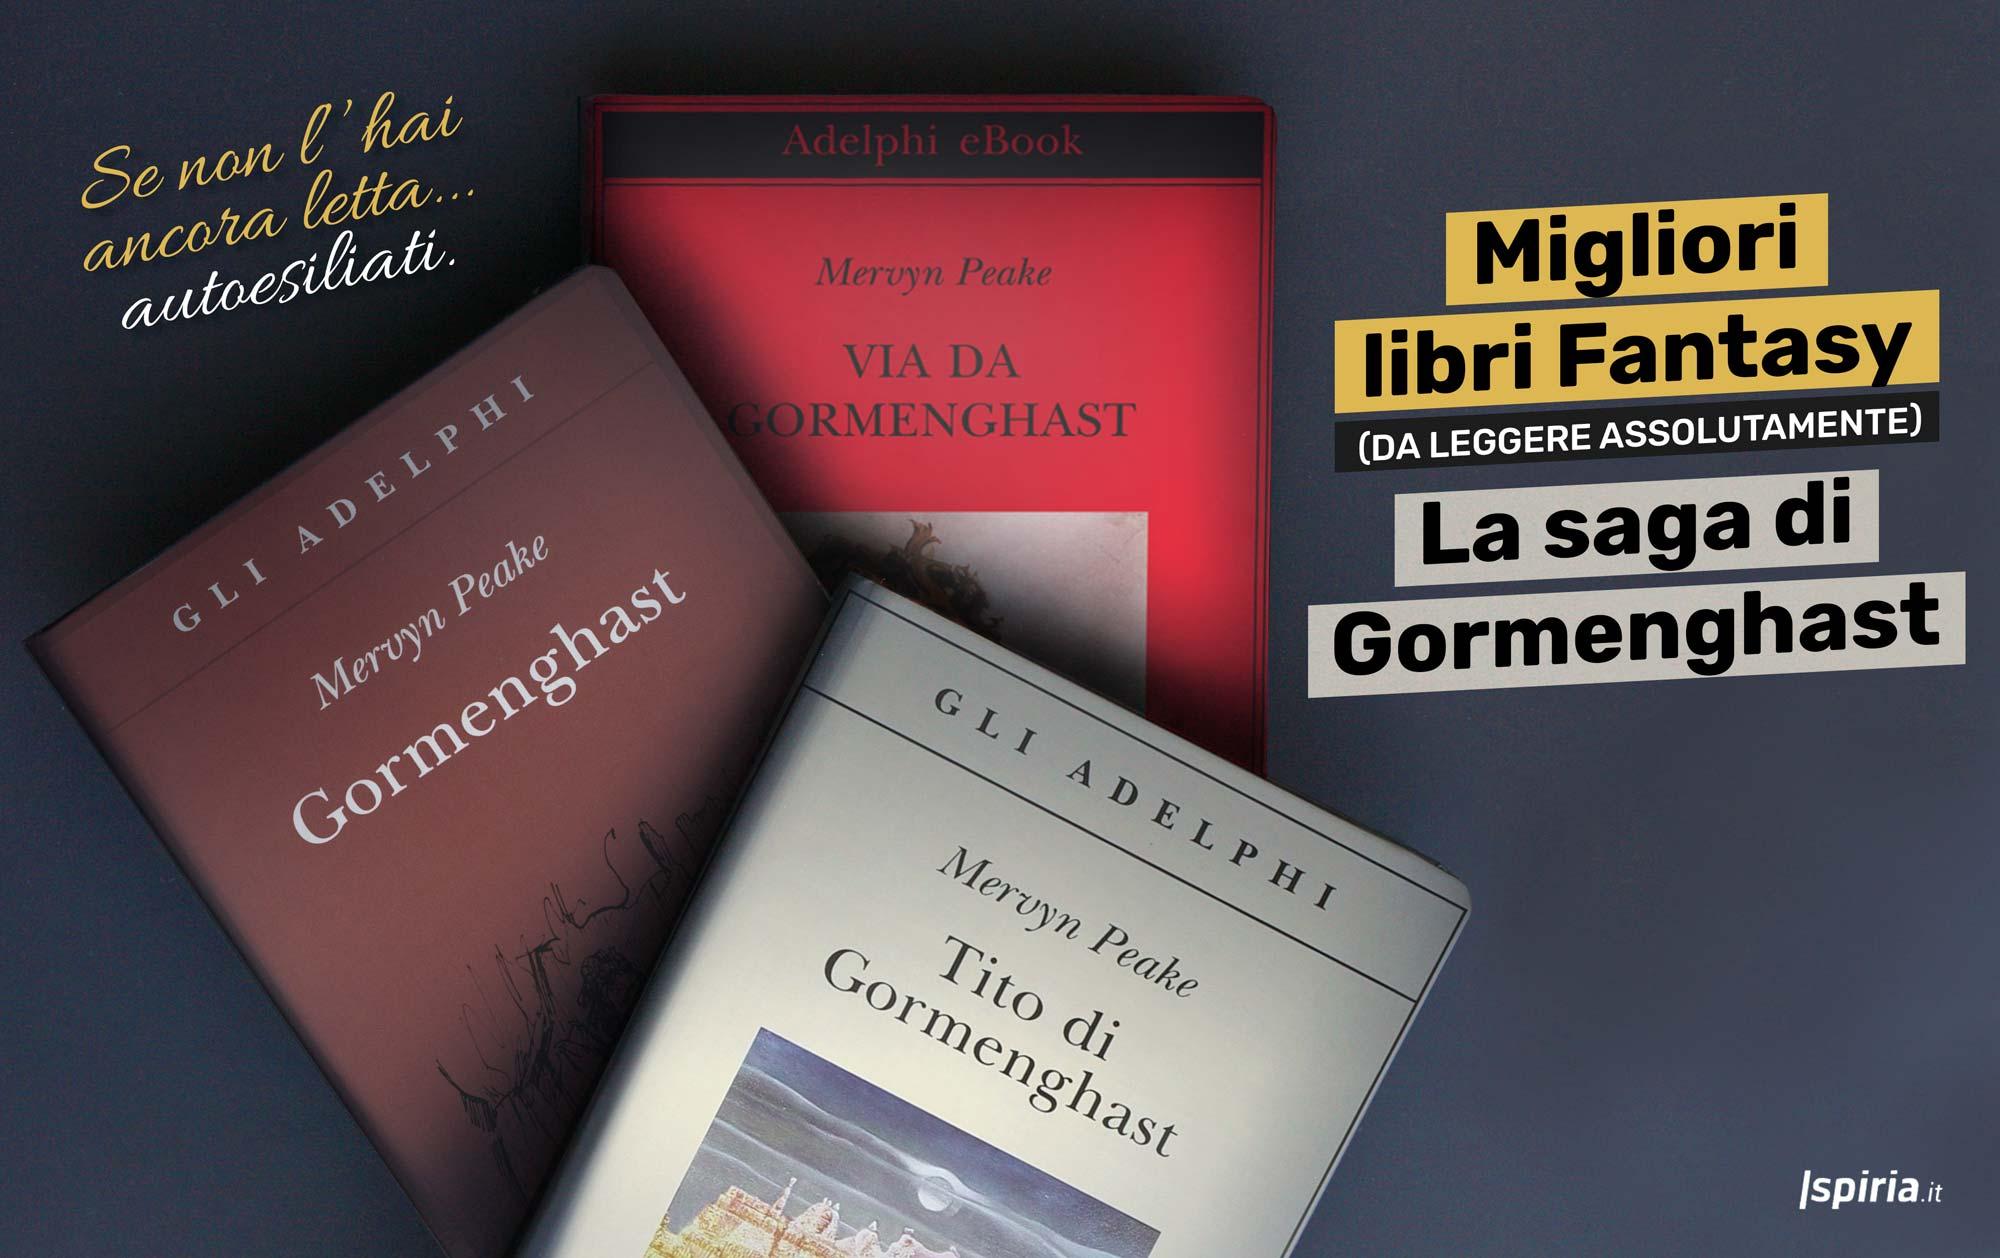 Saga di gormenghast migliori libri fantasy da leggere for Bei romanzi da leggere